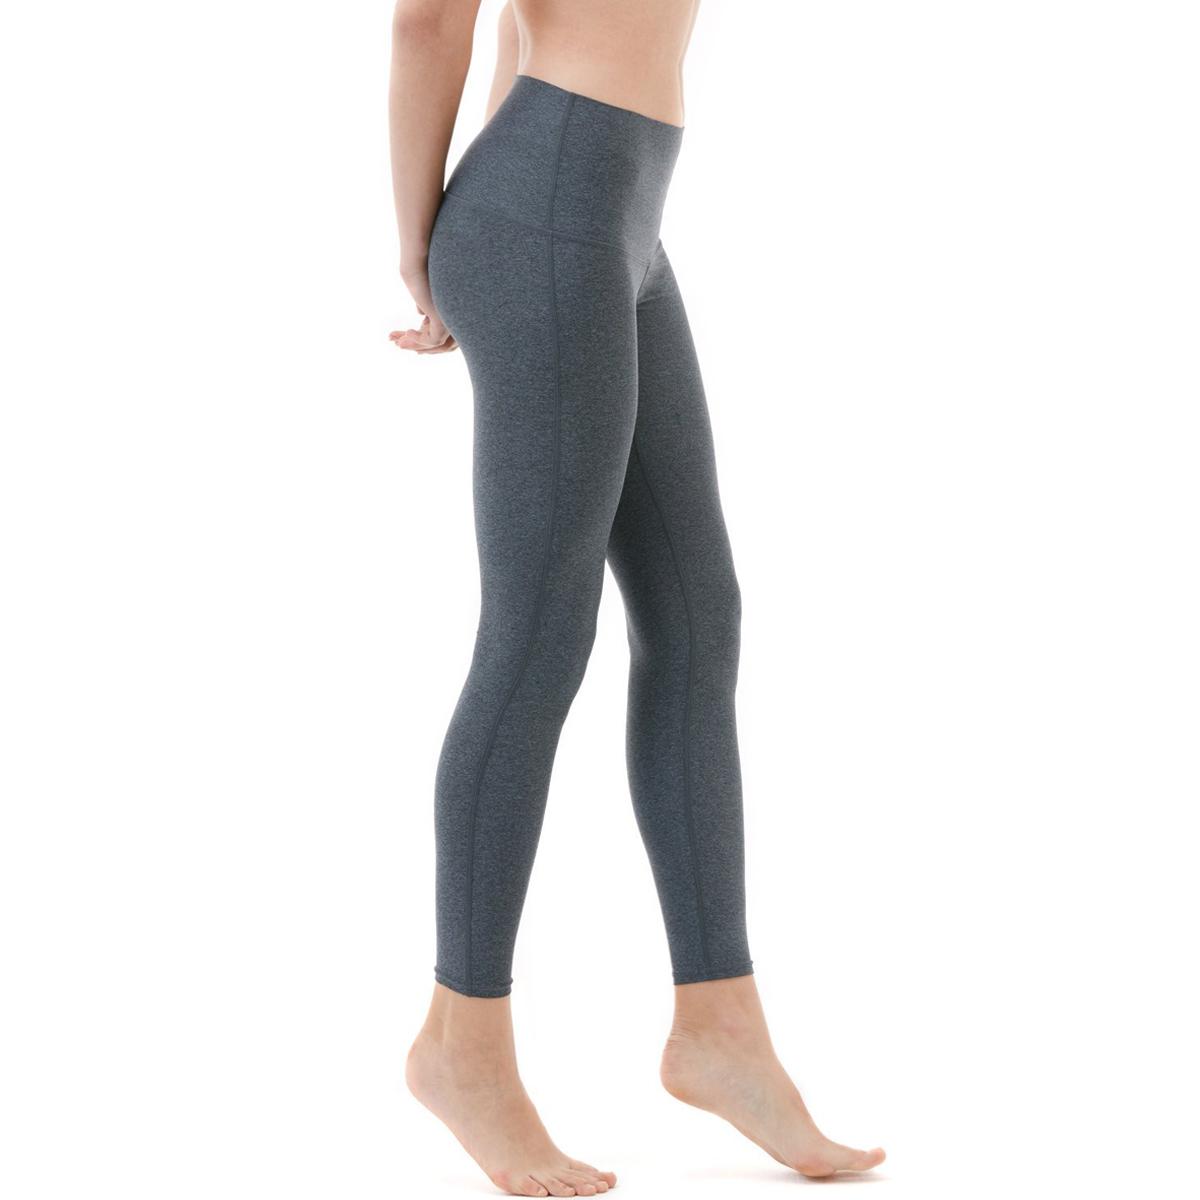 thumbnail 8 - TSLA Tesla FYP42 Women's High-Waisted Ultra-Stretch Tummy Control Yoga Pants